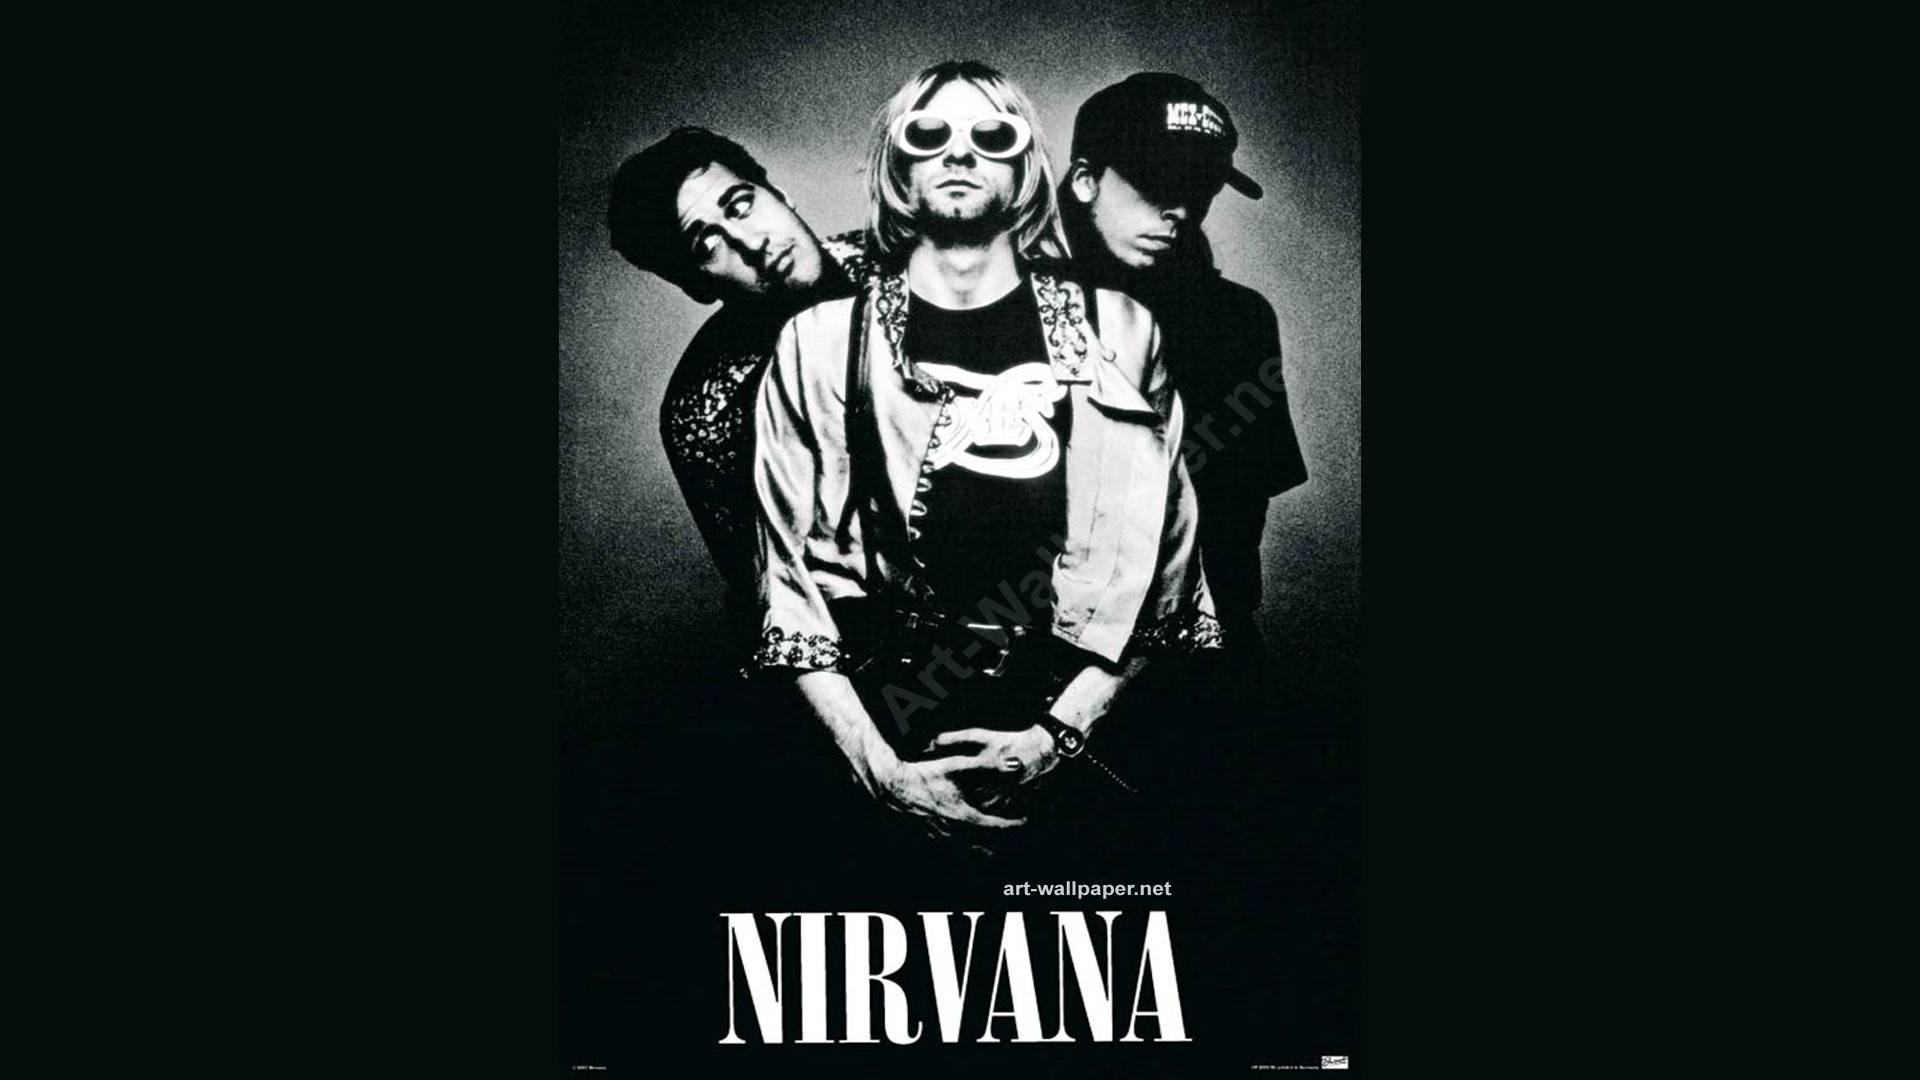 Nirvana Logo Wallpaper Nirvana Nirvana Wallpaper 1920x1080